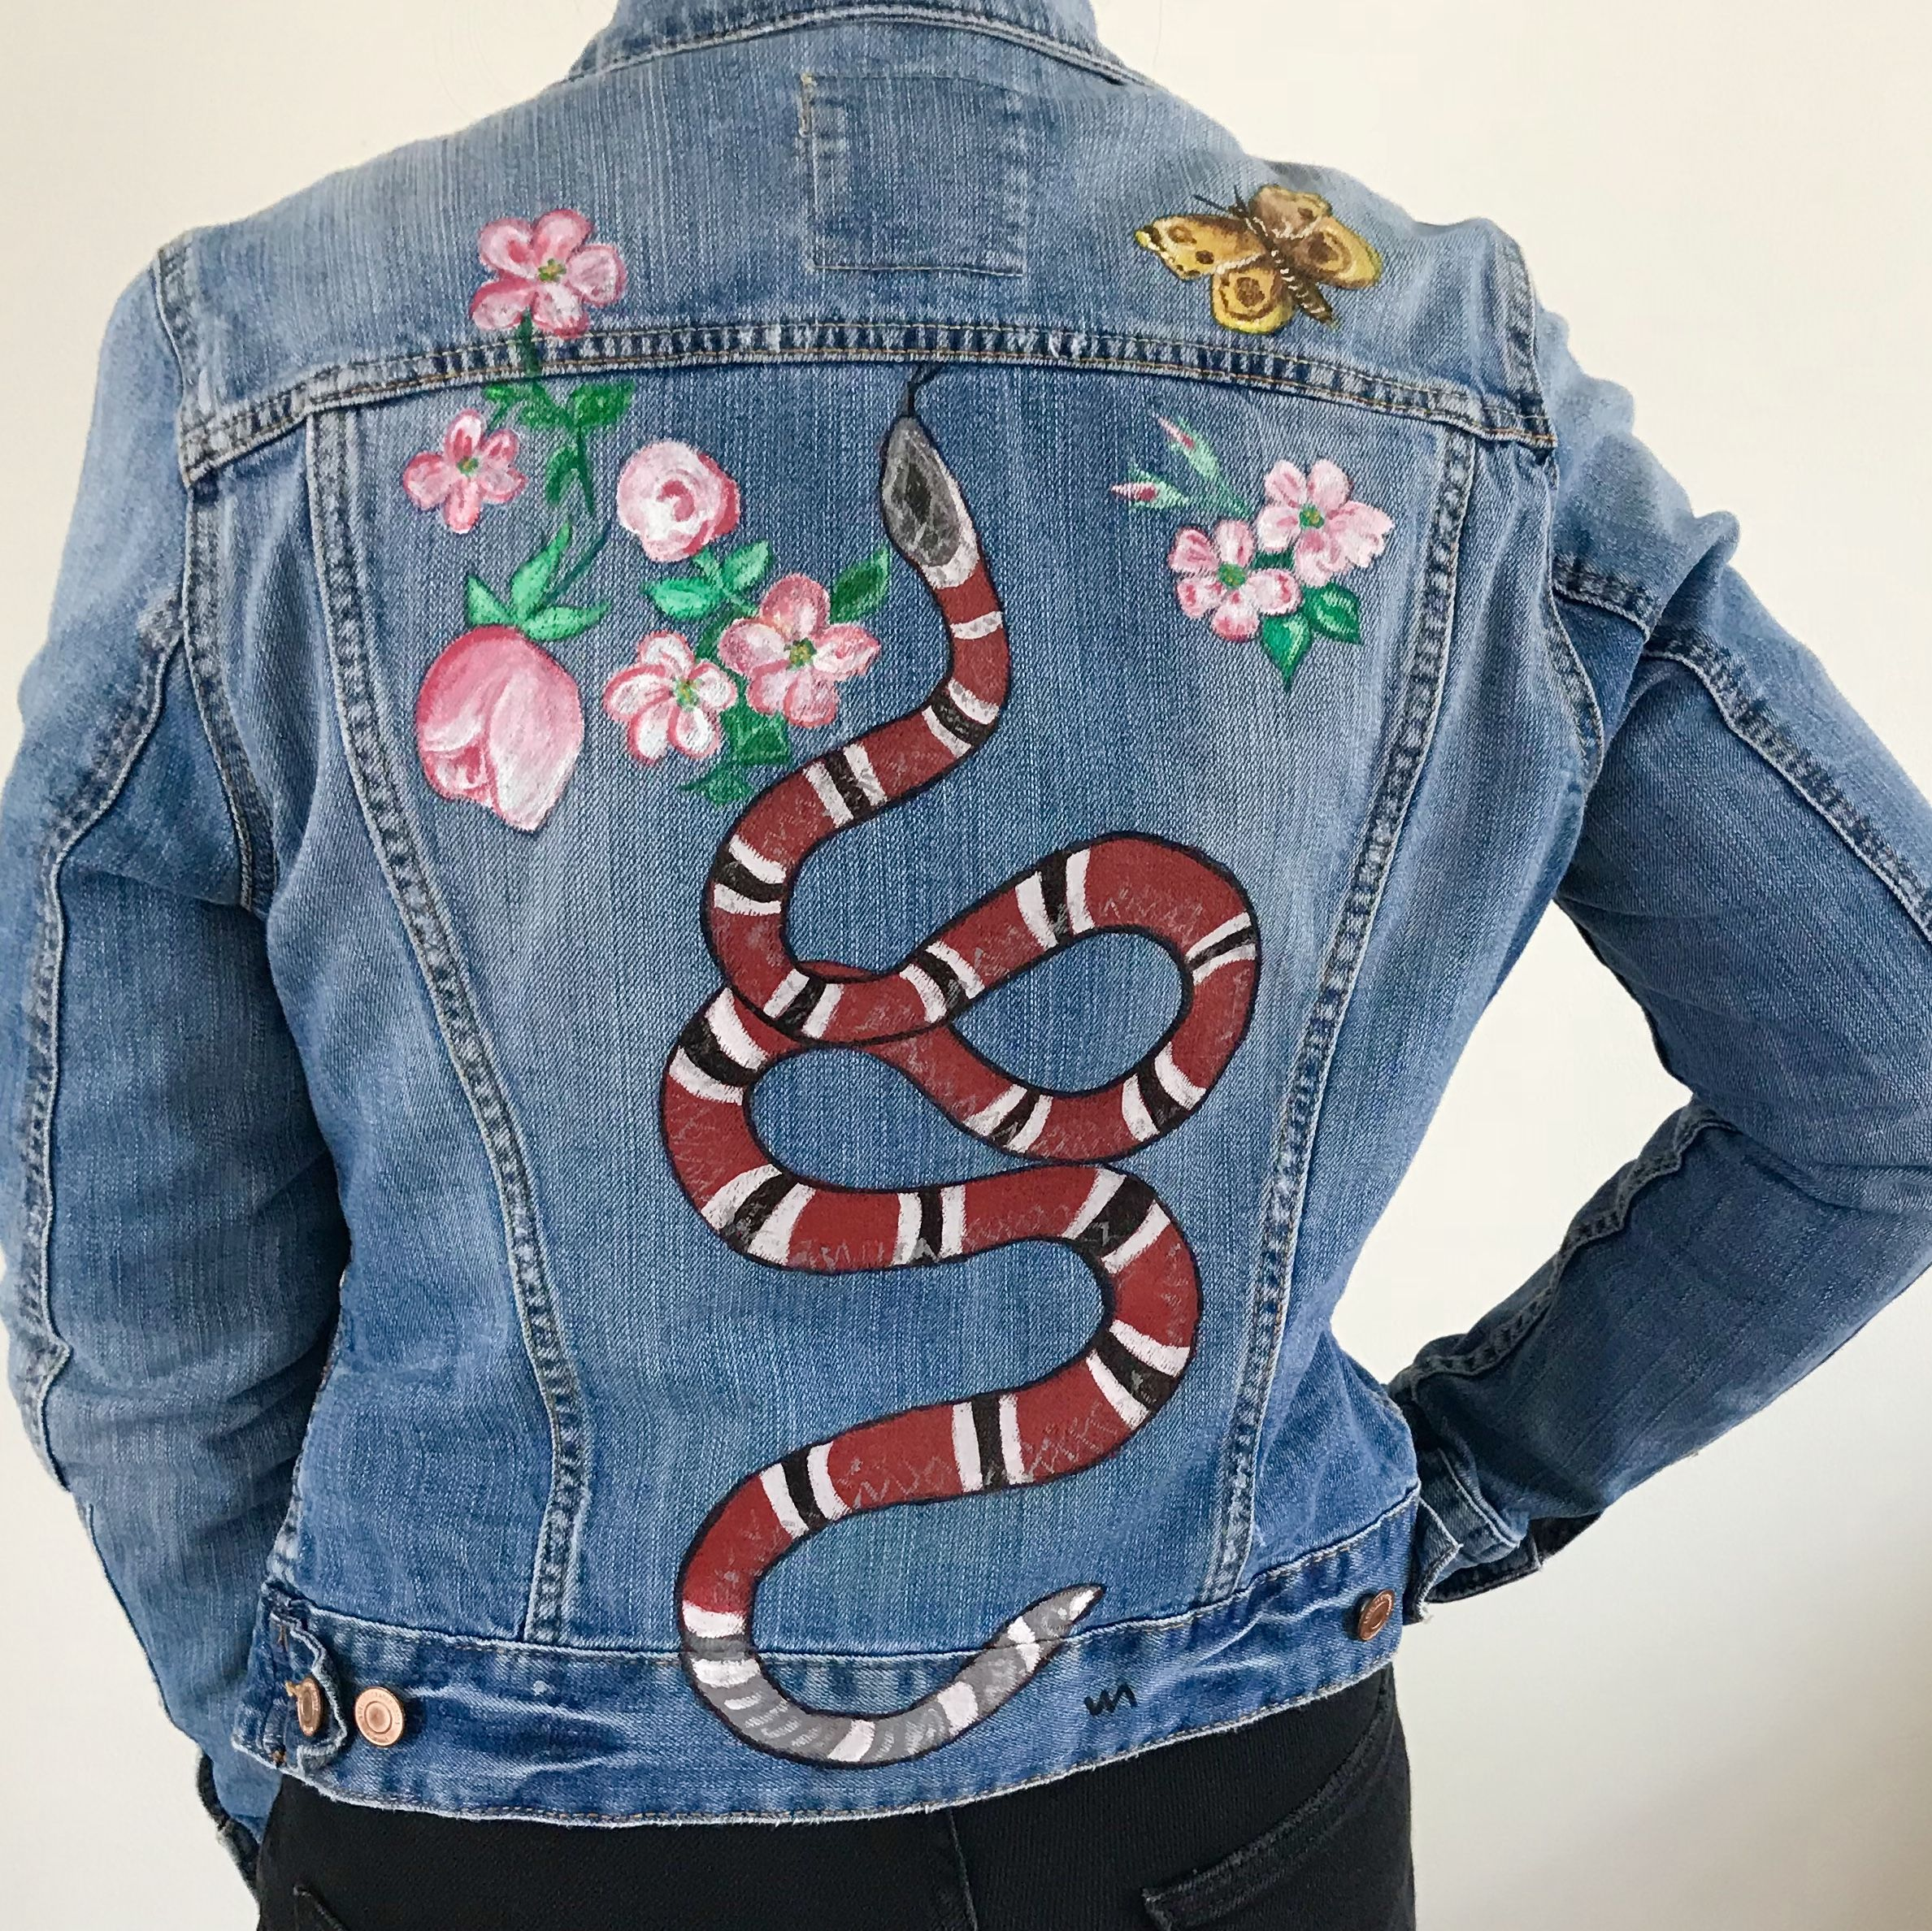 b0799b3839181 Gucci inspired GG hand painted jacket snake denim flowers nature ...